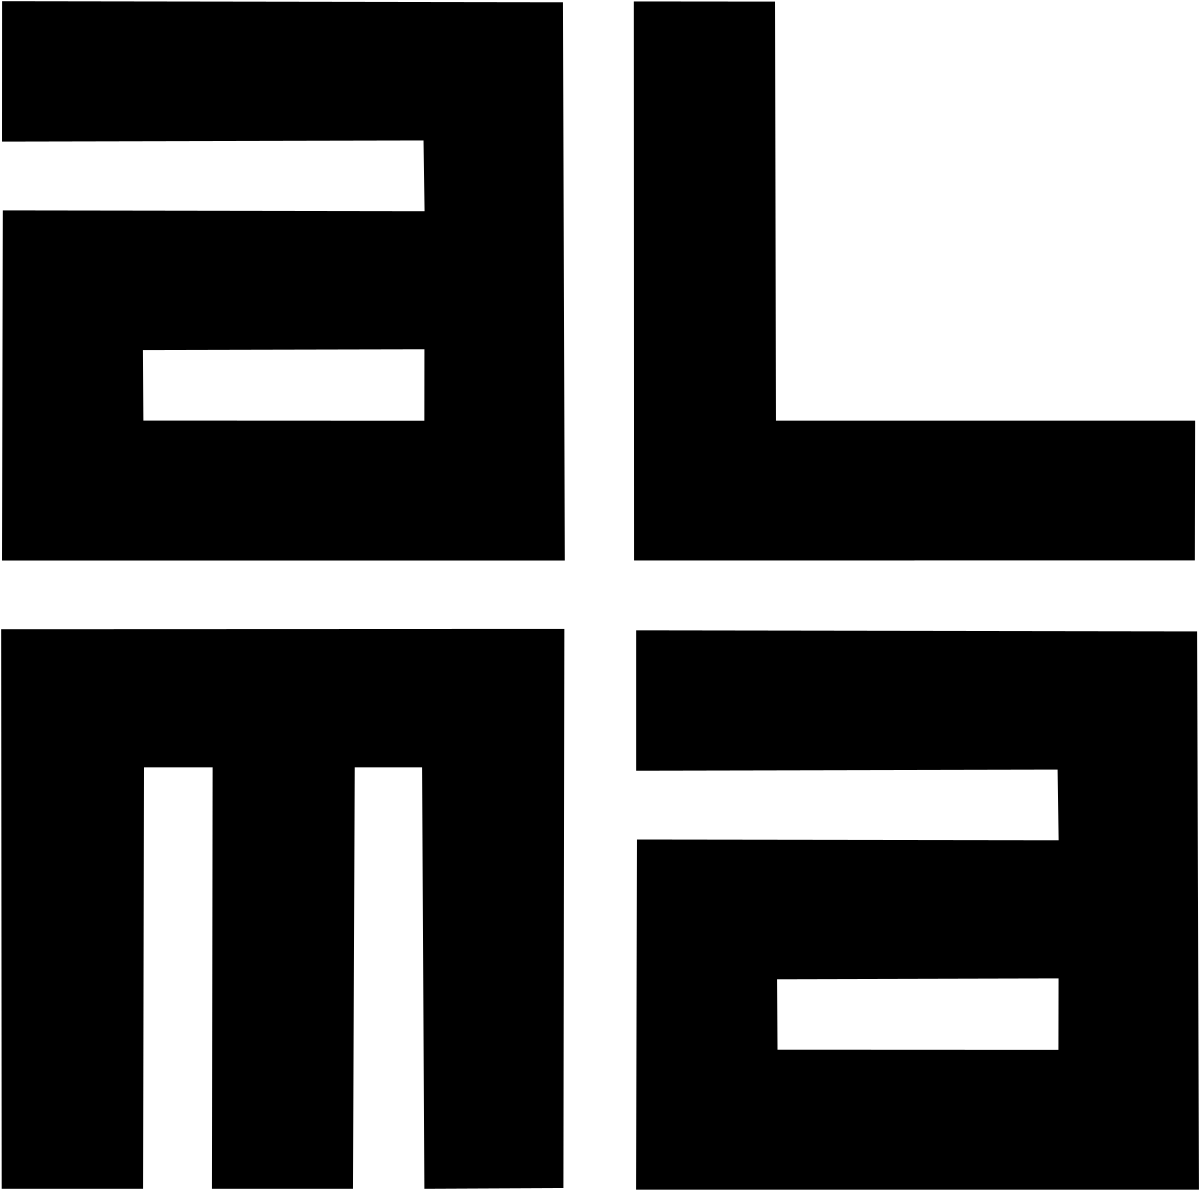 alma_logo_black.png (18 KB)